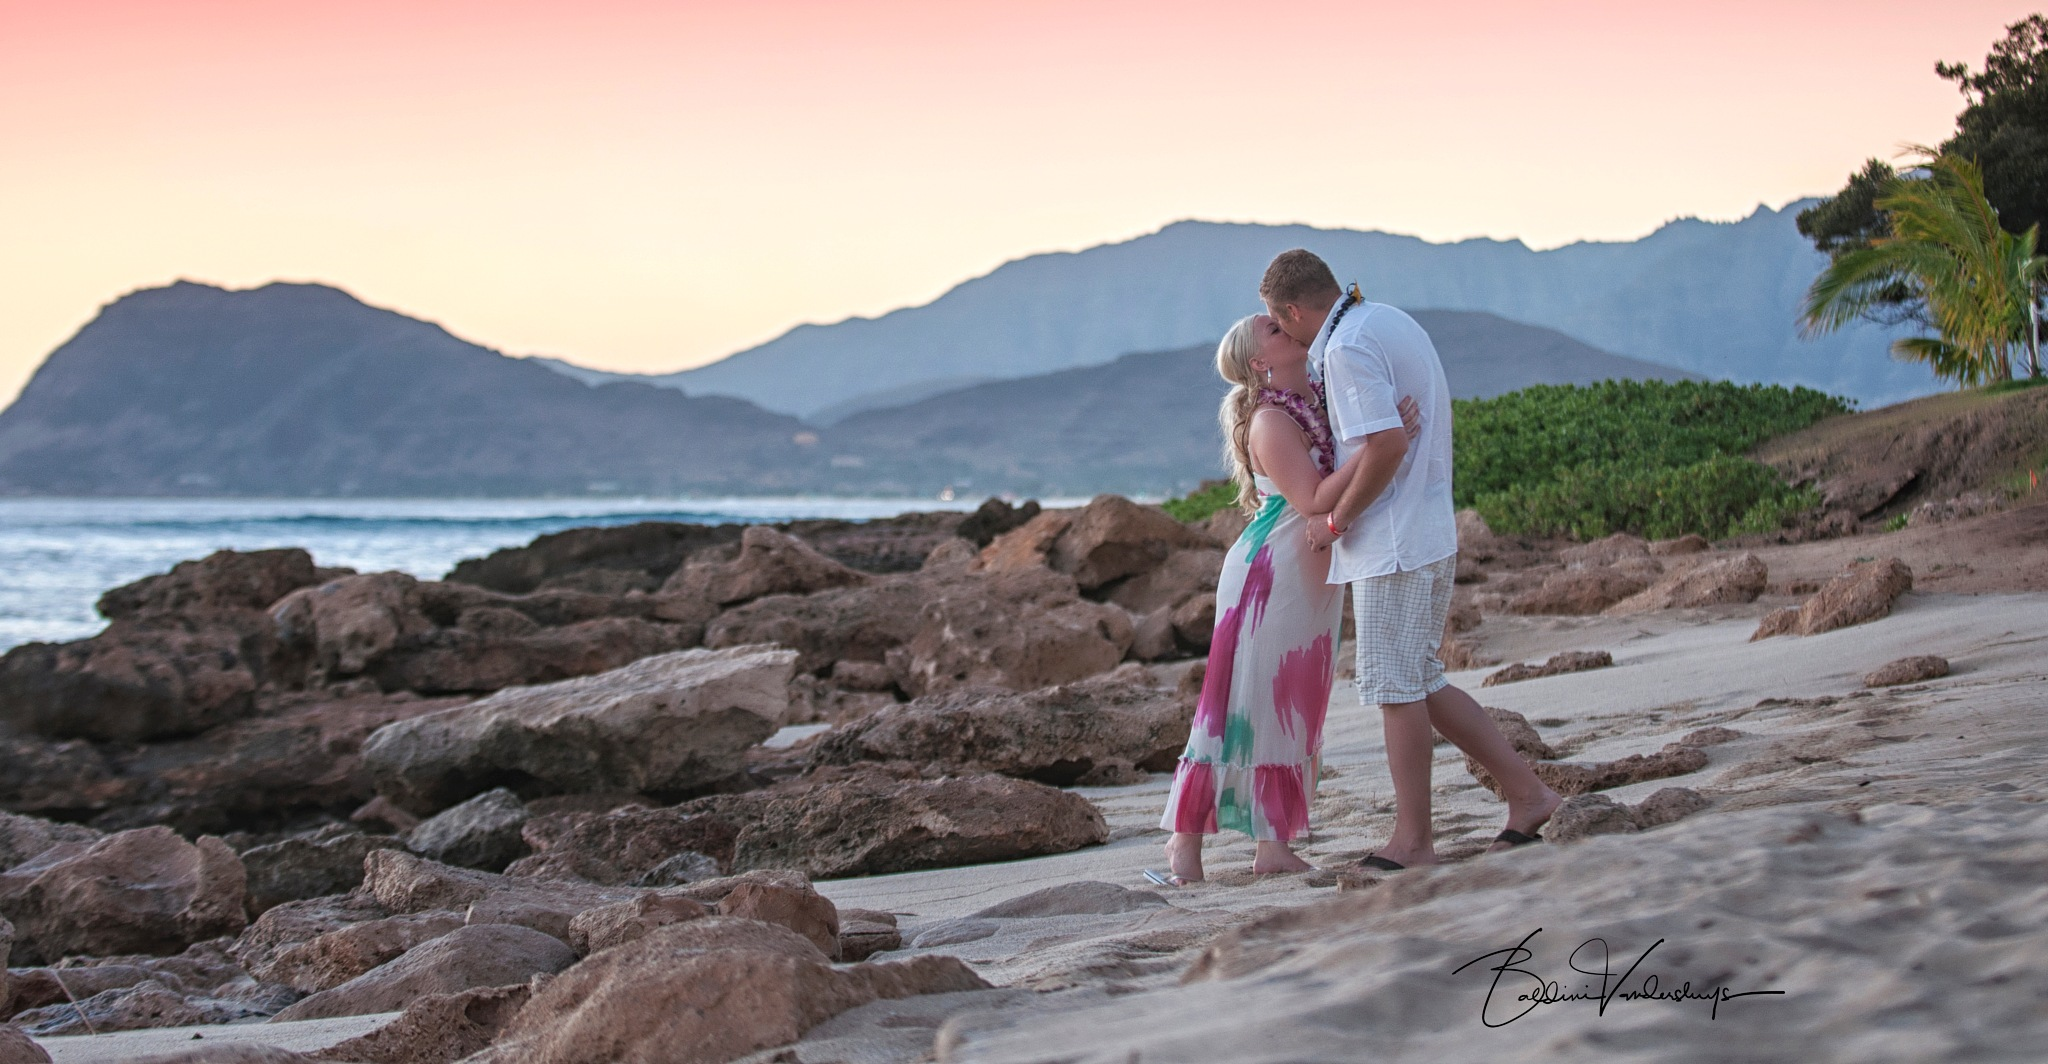 Kiss on the Beach by charlesvandersluys